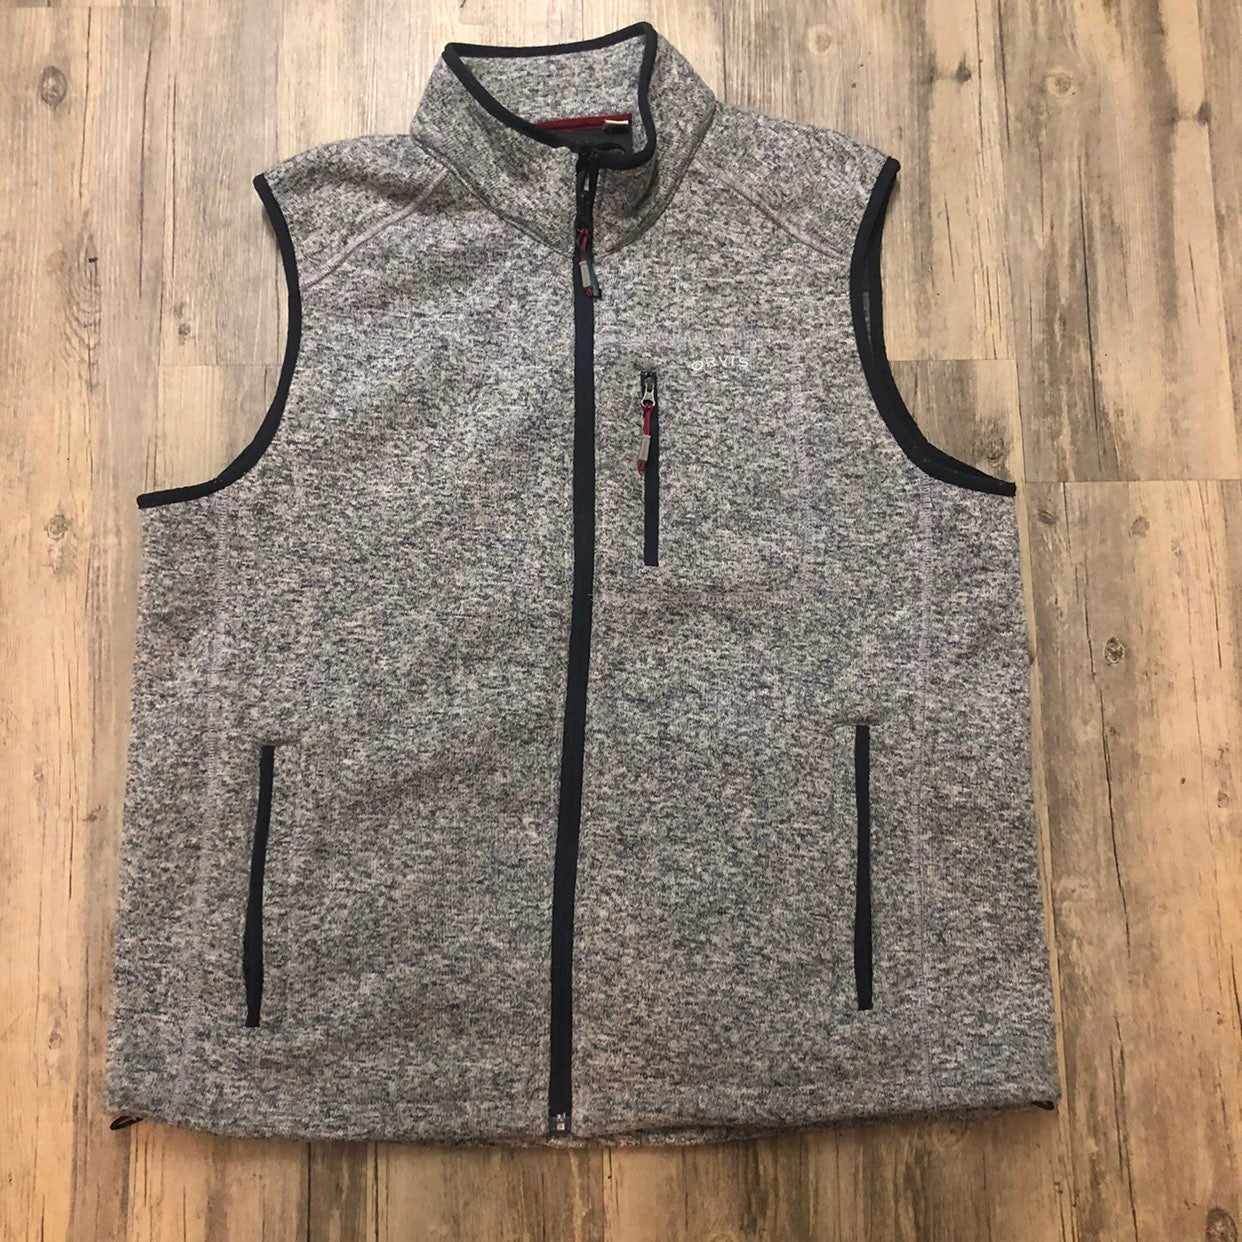 ORVIS Heathered Gray Fleece Sweater